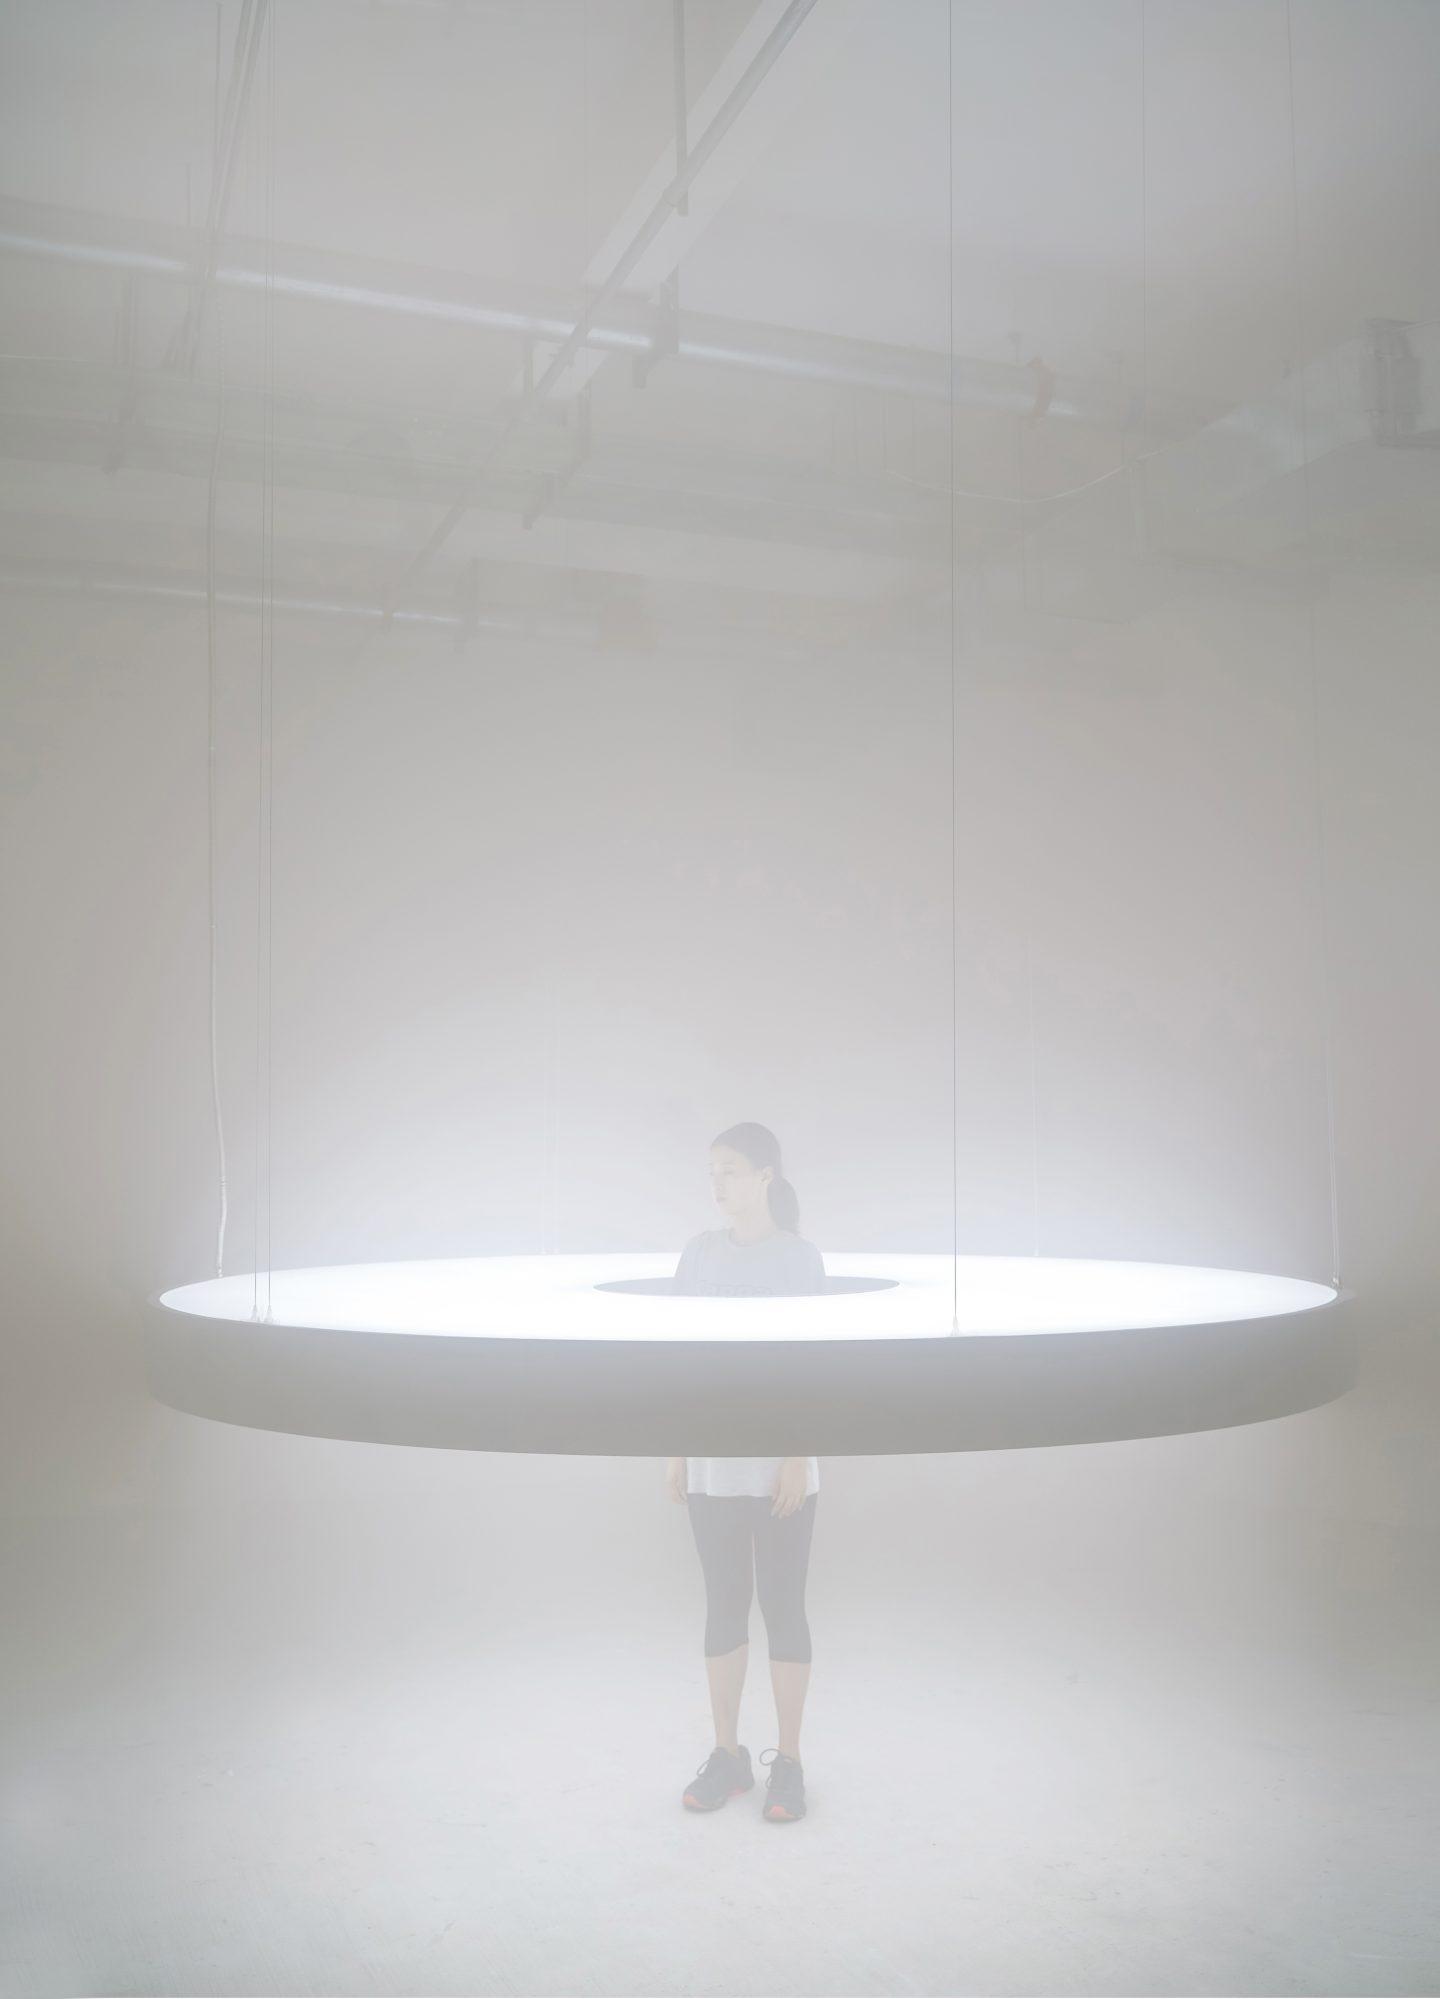 IGNANT-Art-Karolina-Halatek-Halo-02